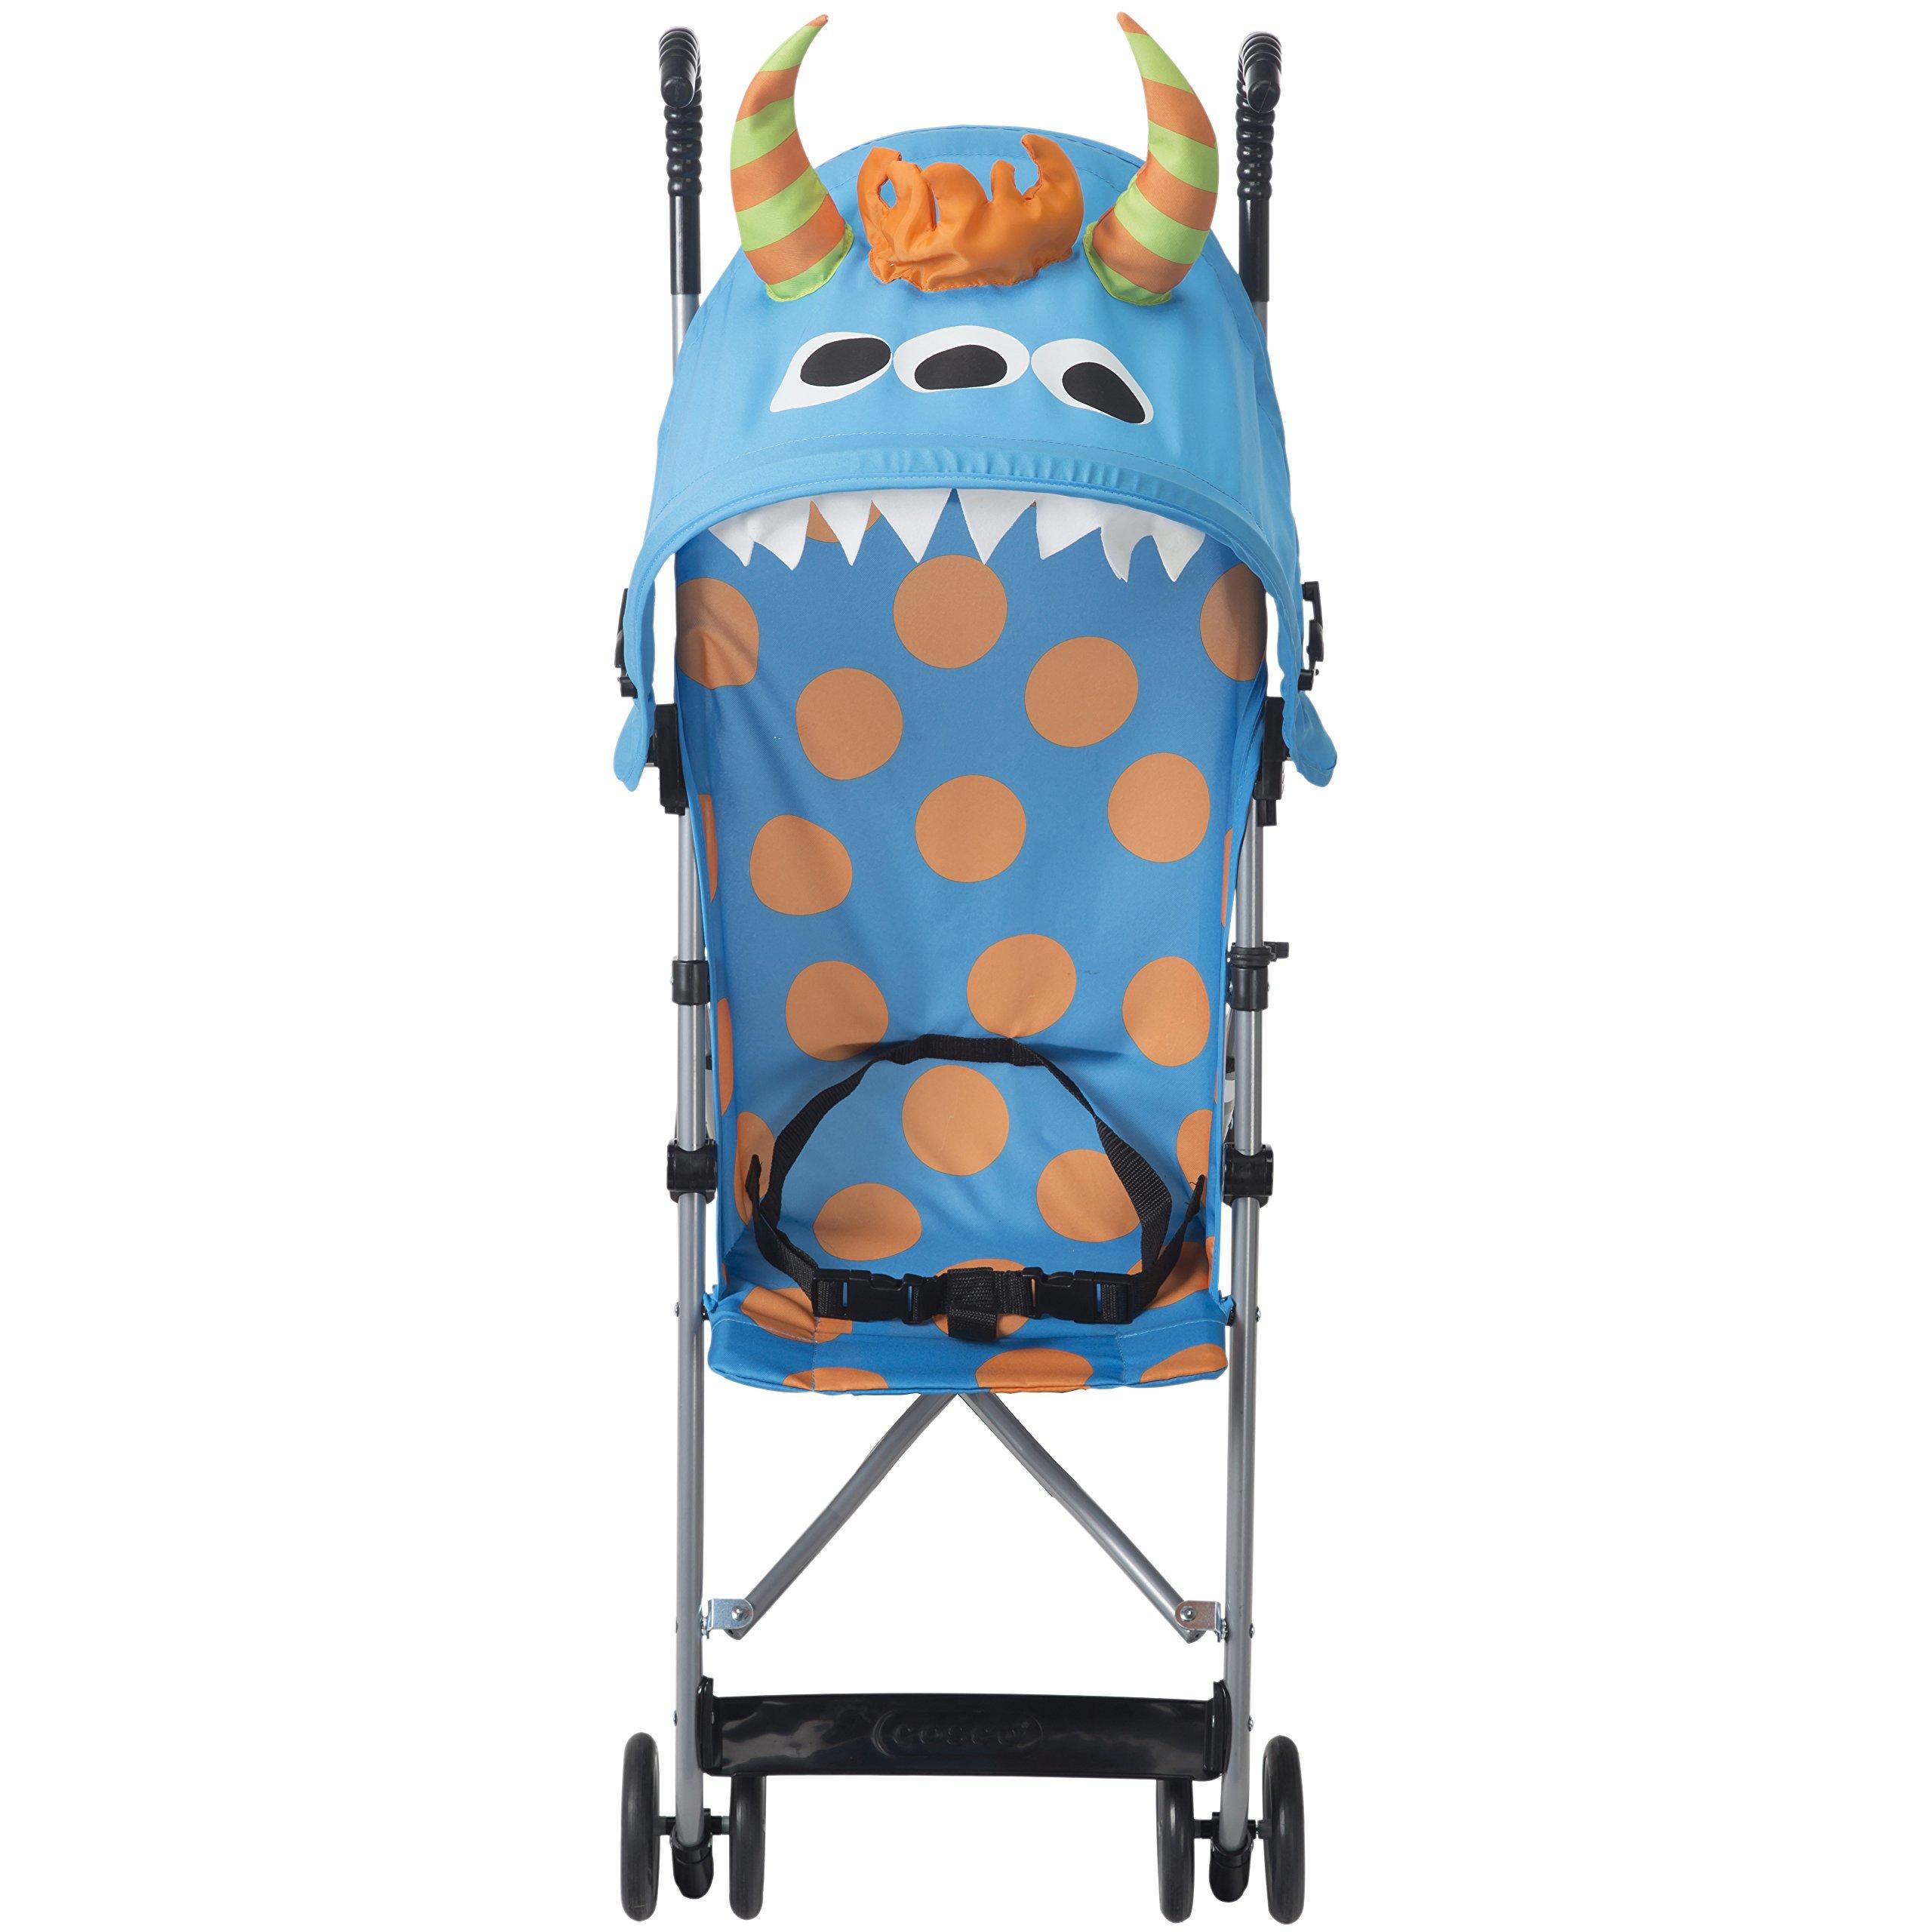 Cosco Character Umbrella Stroller, Monster Syd